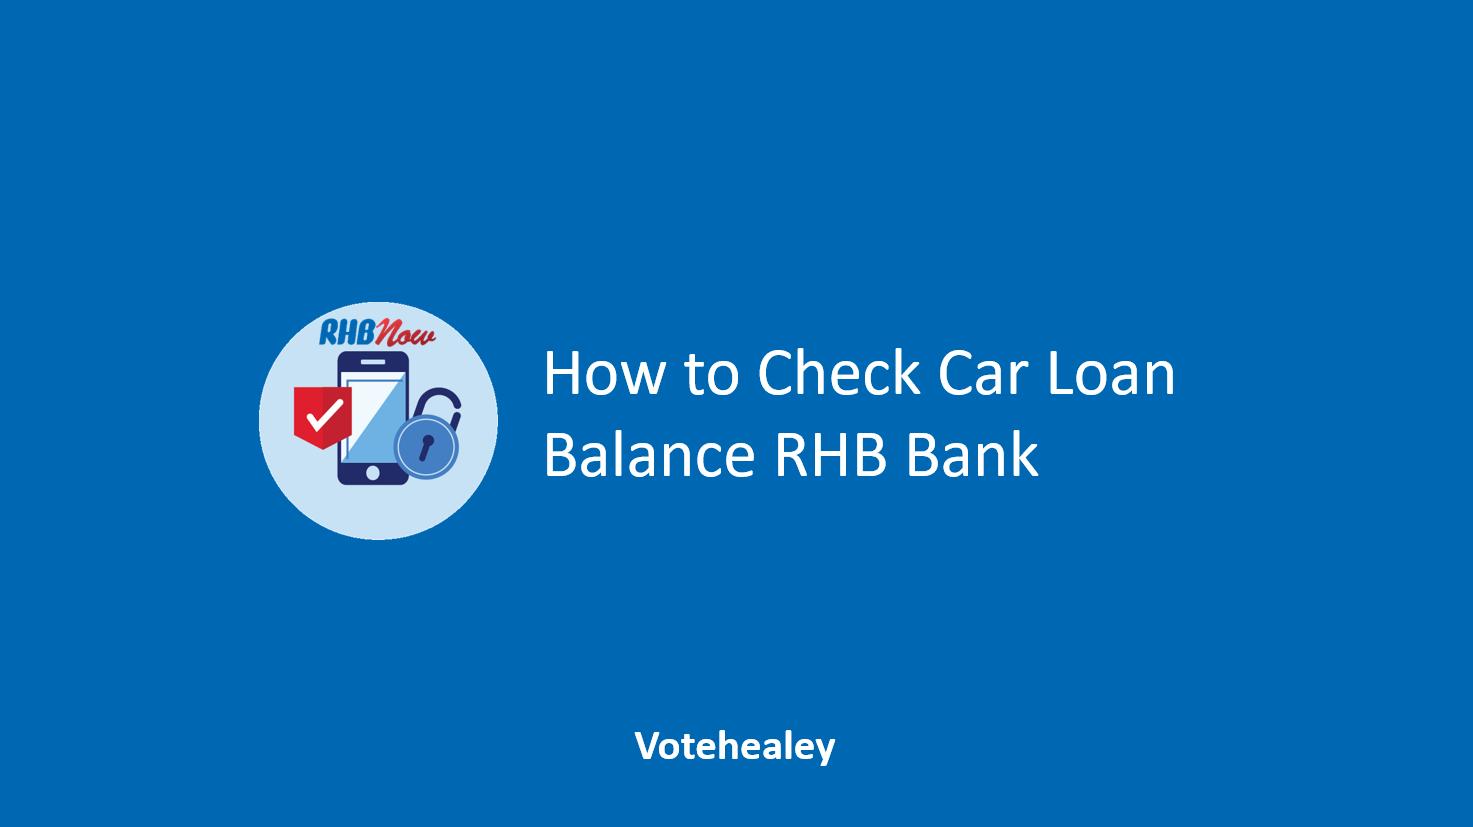 How to Check Car Loan Balance RHB Bank